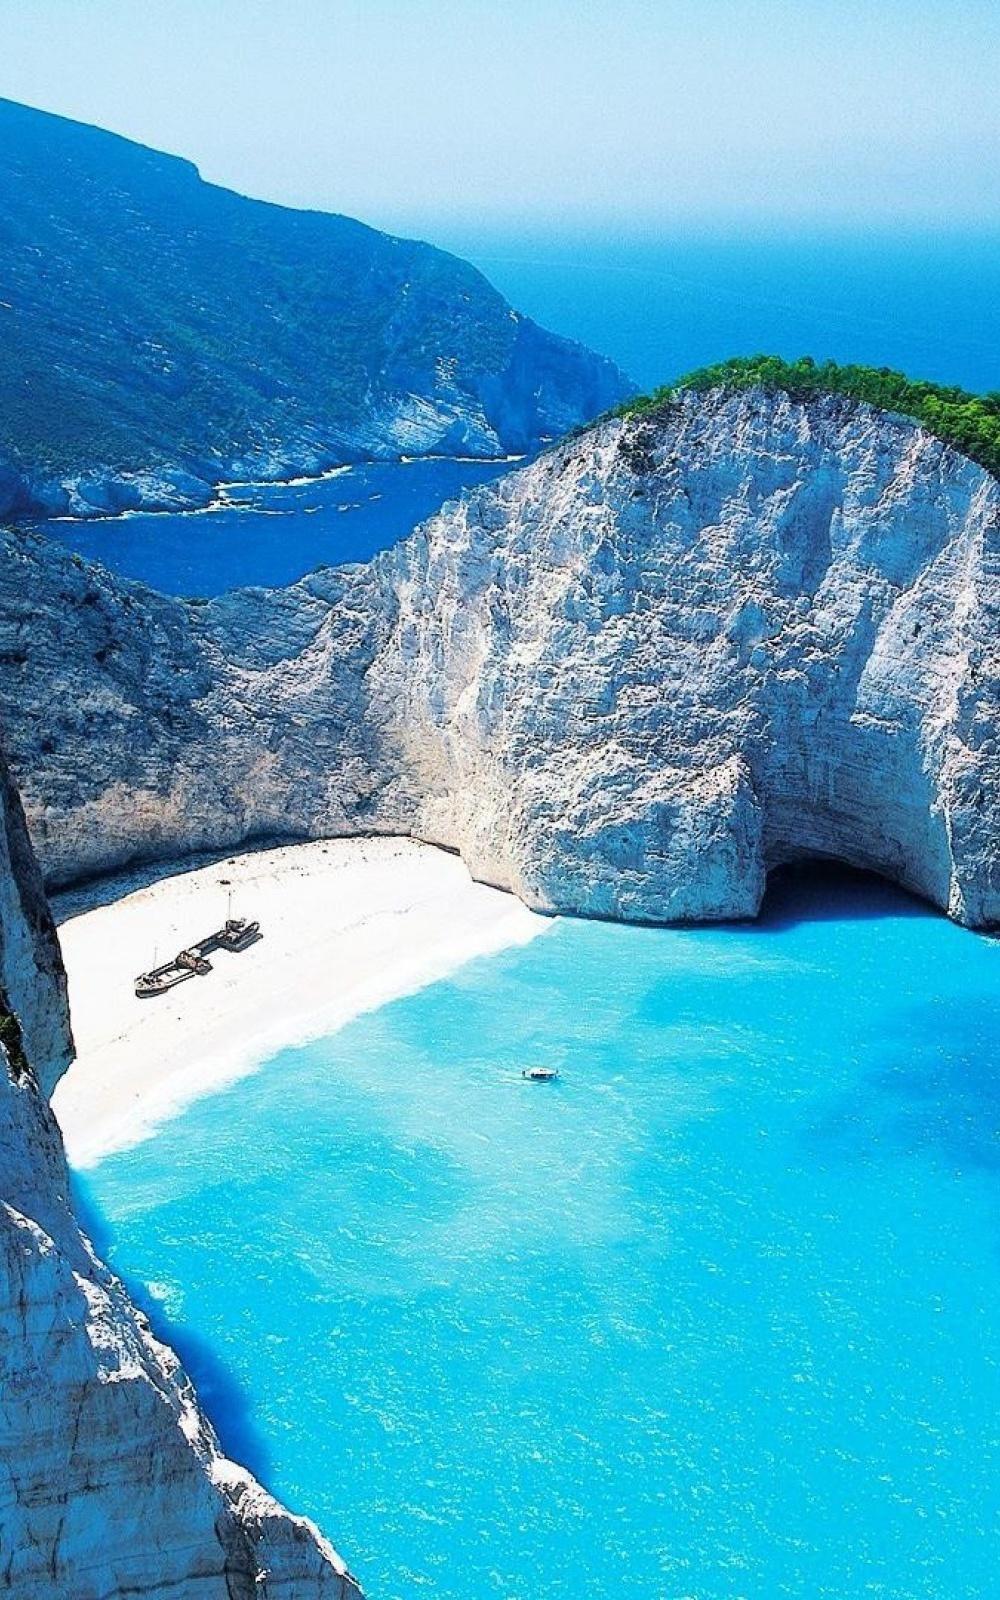 Navagio Shipwreck Beach Smugglers Cove Zakynthos Greece iPhone 6 1000x1600